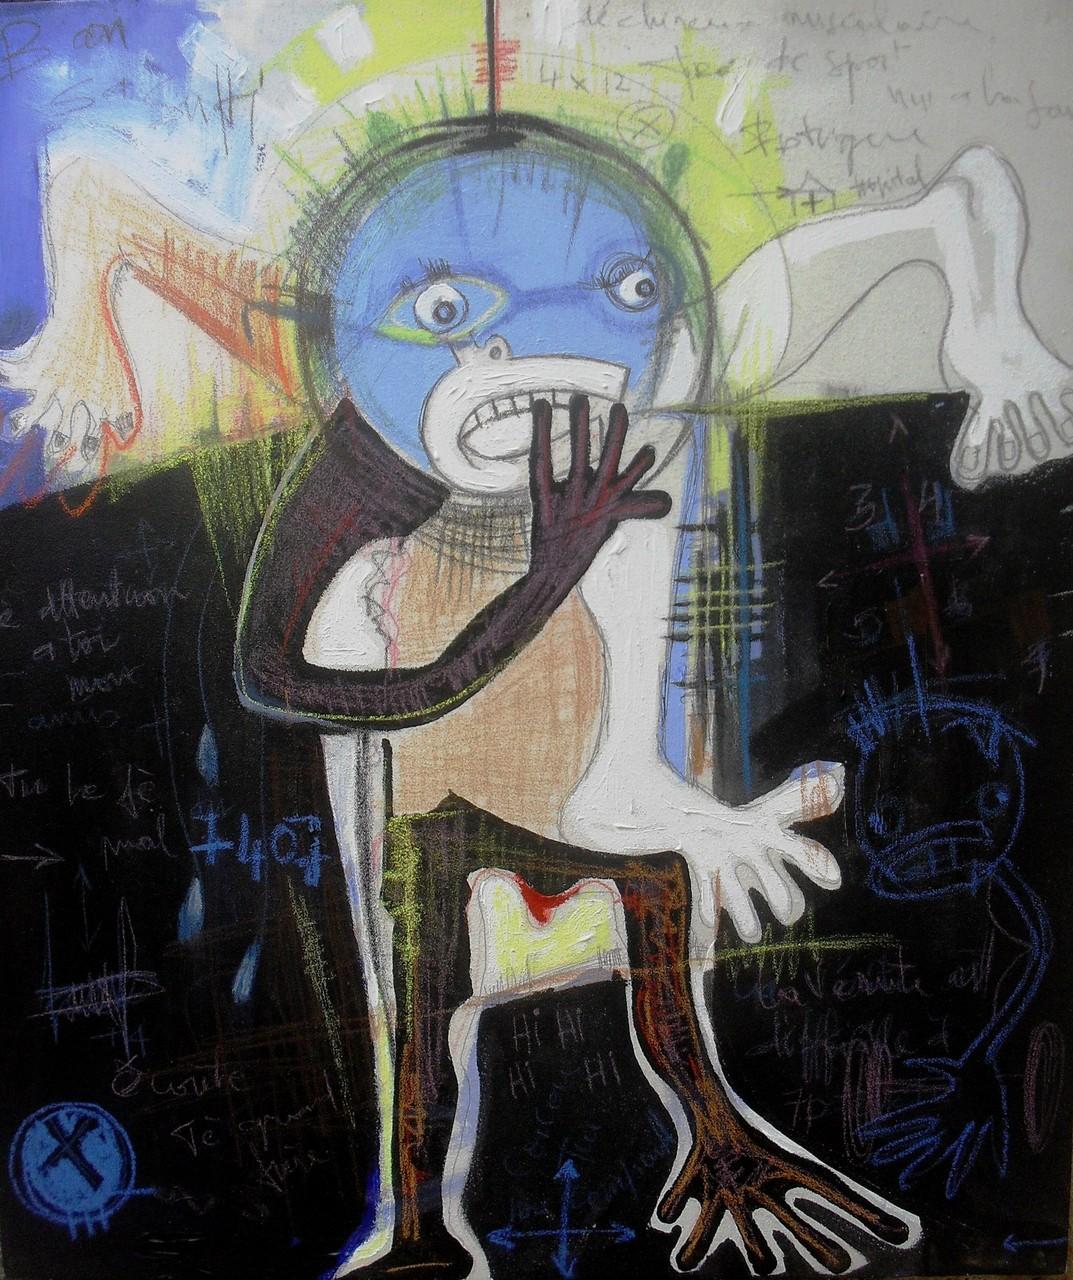 Overdose - 2013 - 60 x 70 cm - Acrylique, pastel